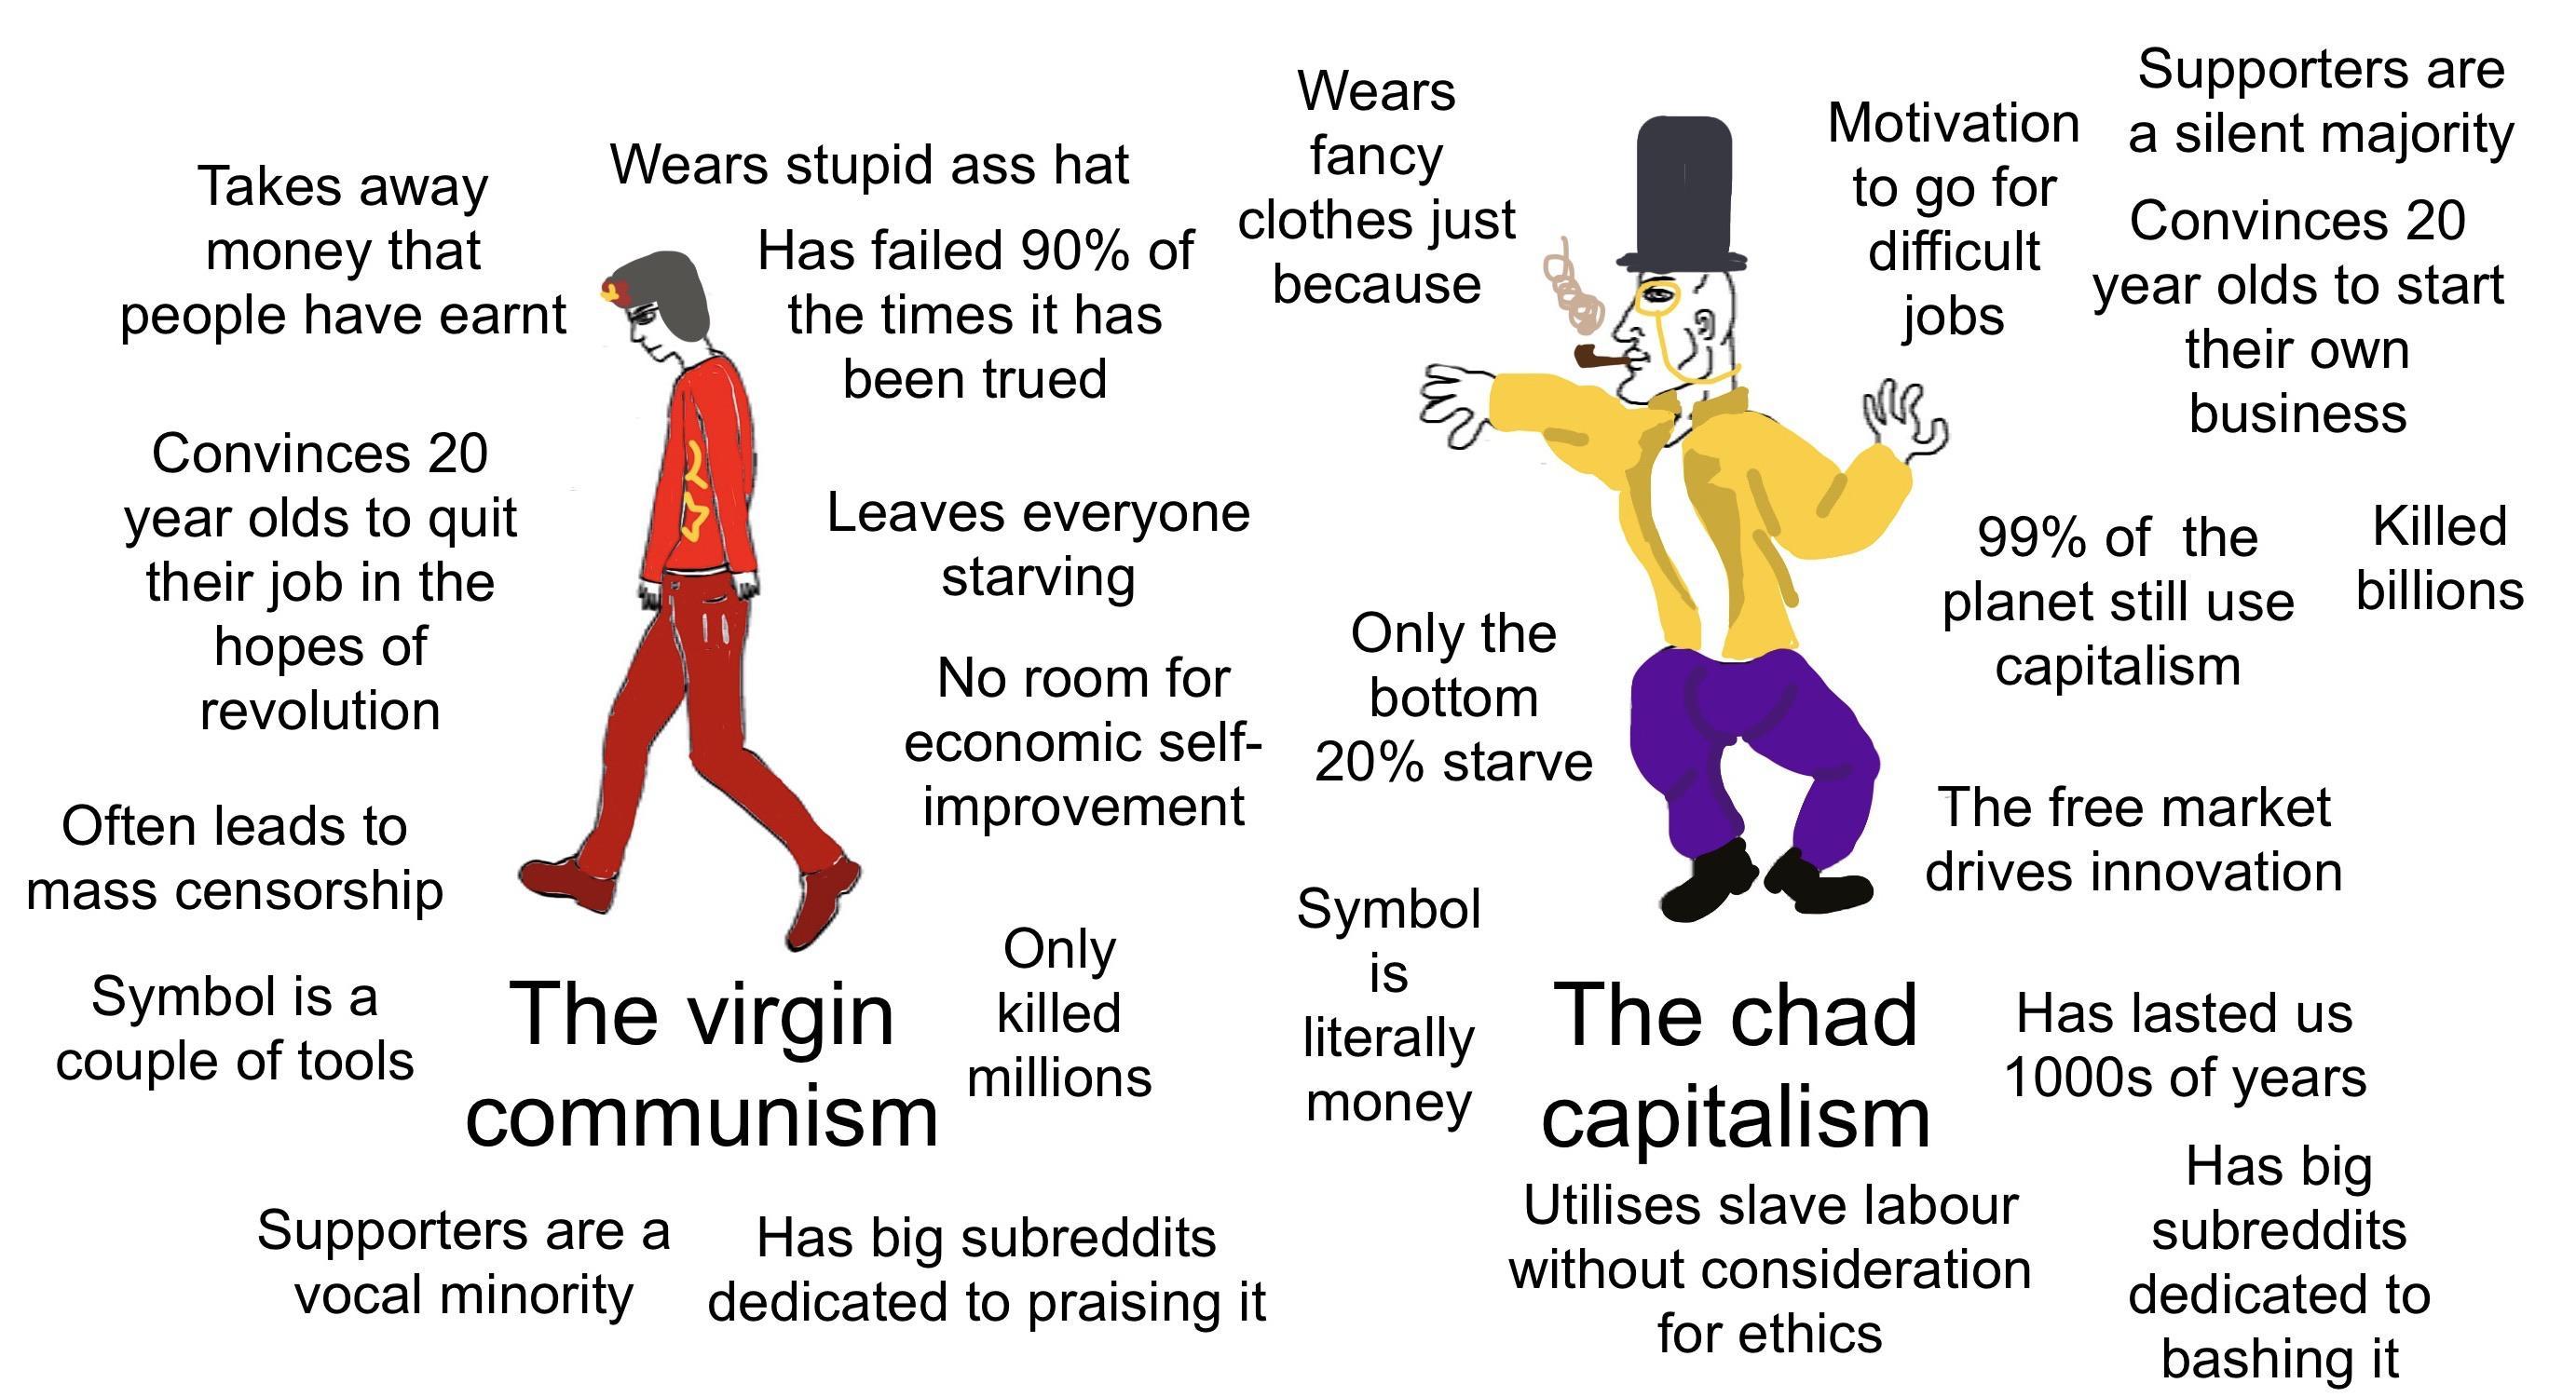 The Virgin Communism Vs The Chad Capitalism Virginvschad